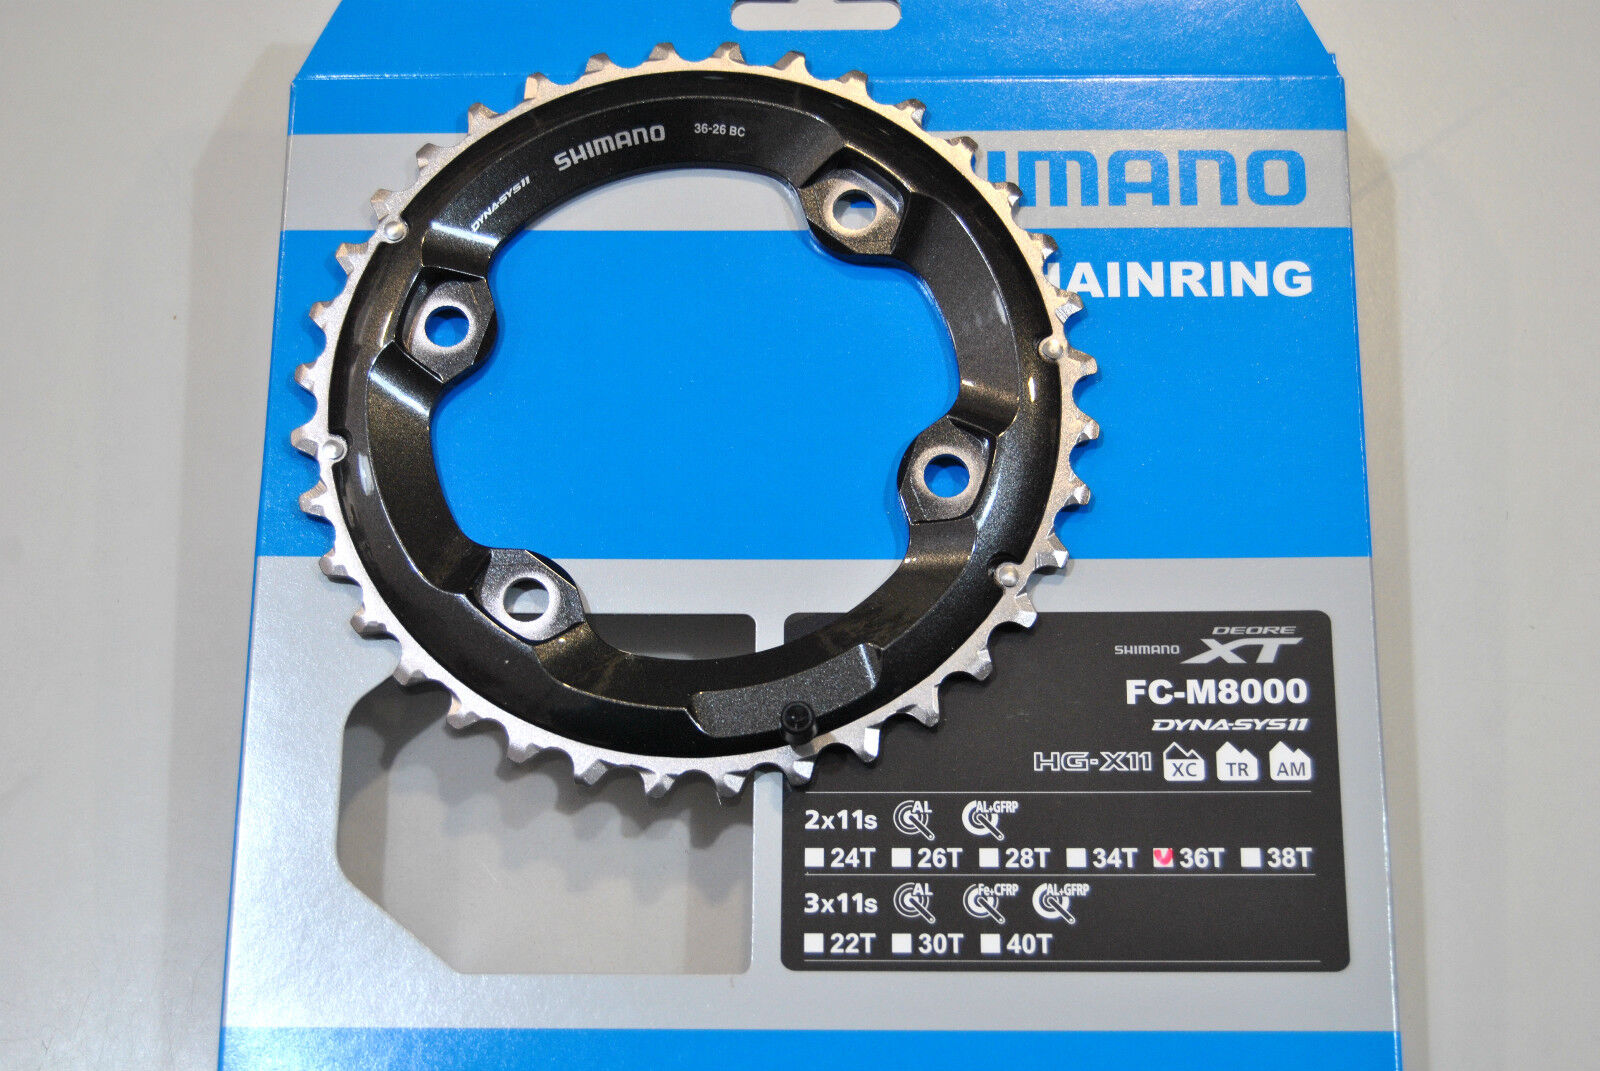 Corona SHIMANO XT 36T BC FC-M8000 ( 36x26 )/CHAINRING SHIMANO XT 36T BC FC-M8000